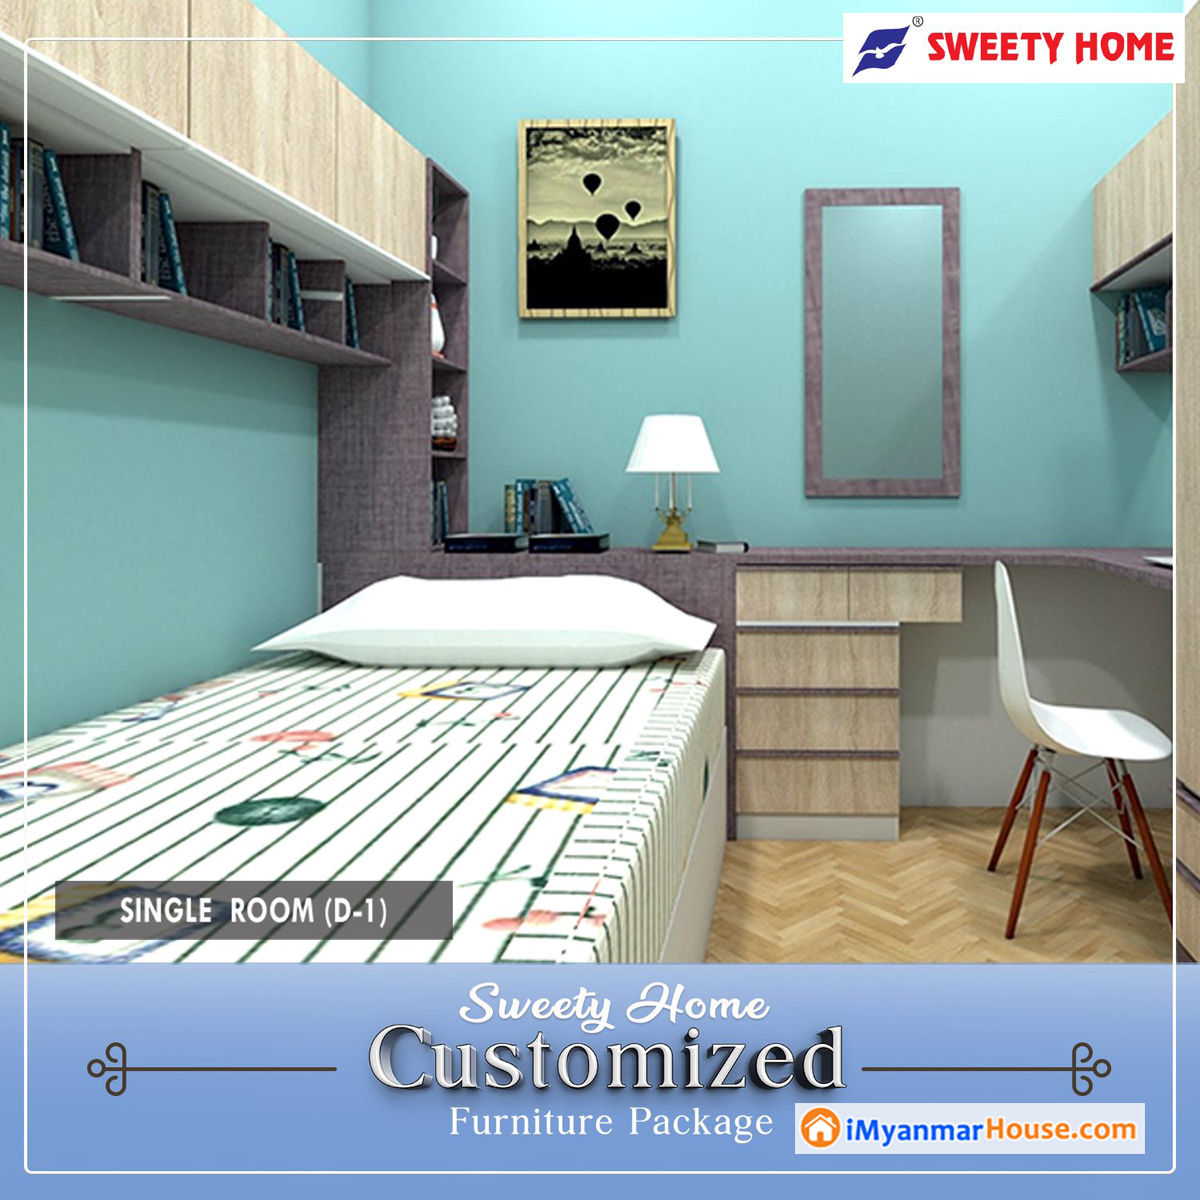 Sweety Home